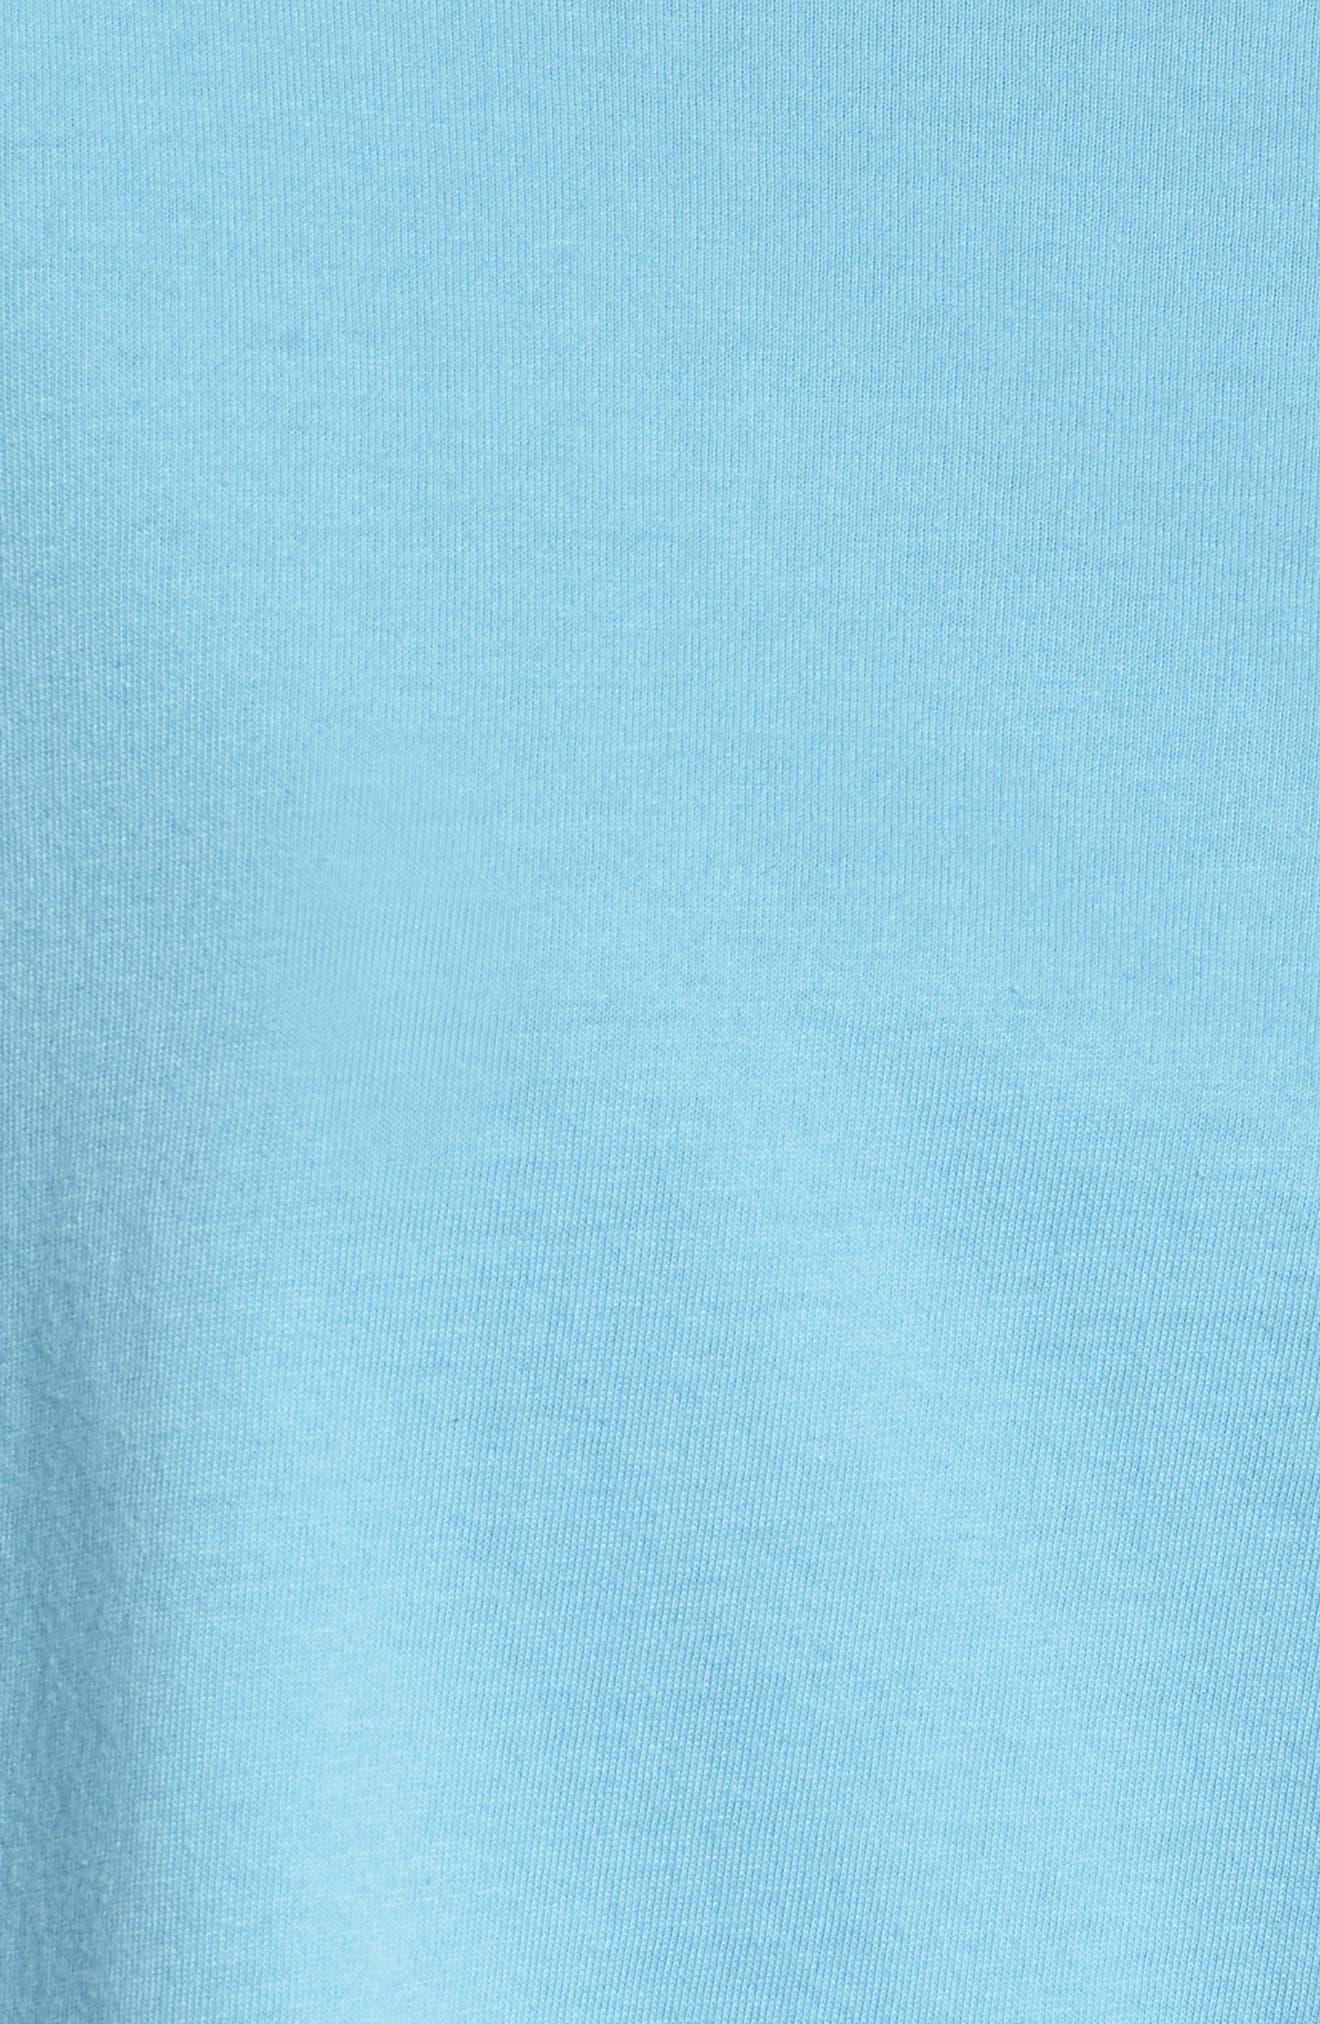 Pocket Tee,                             Alternate thumbnail 5, color,                             POWDER BLUE